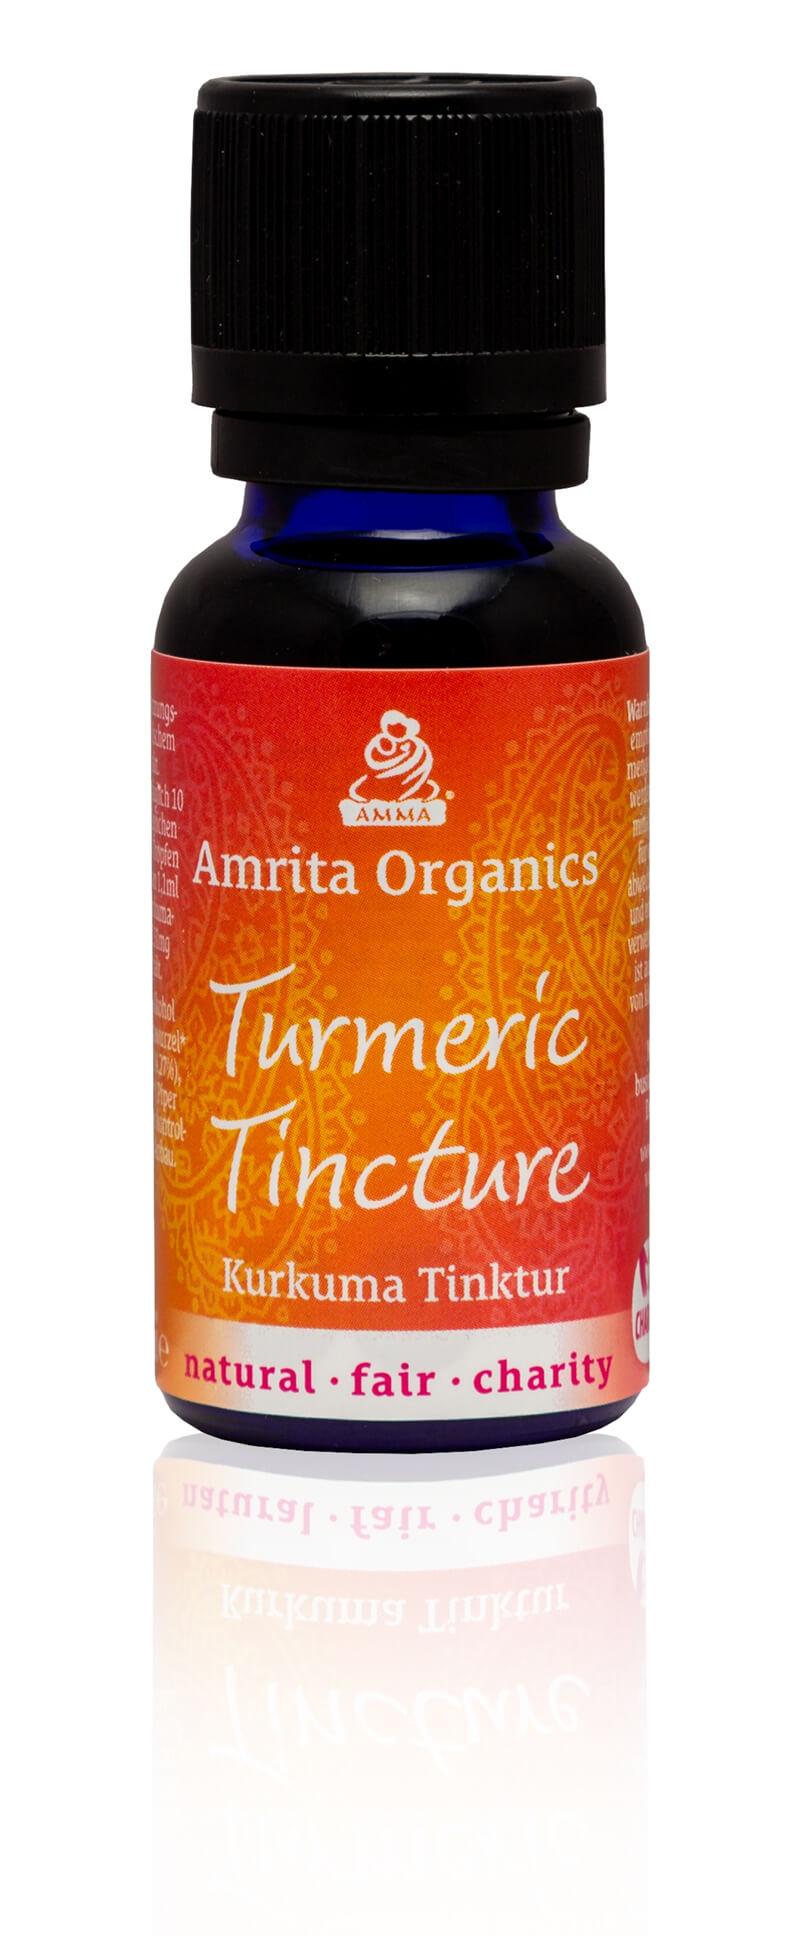 Turmeric tincture, organic